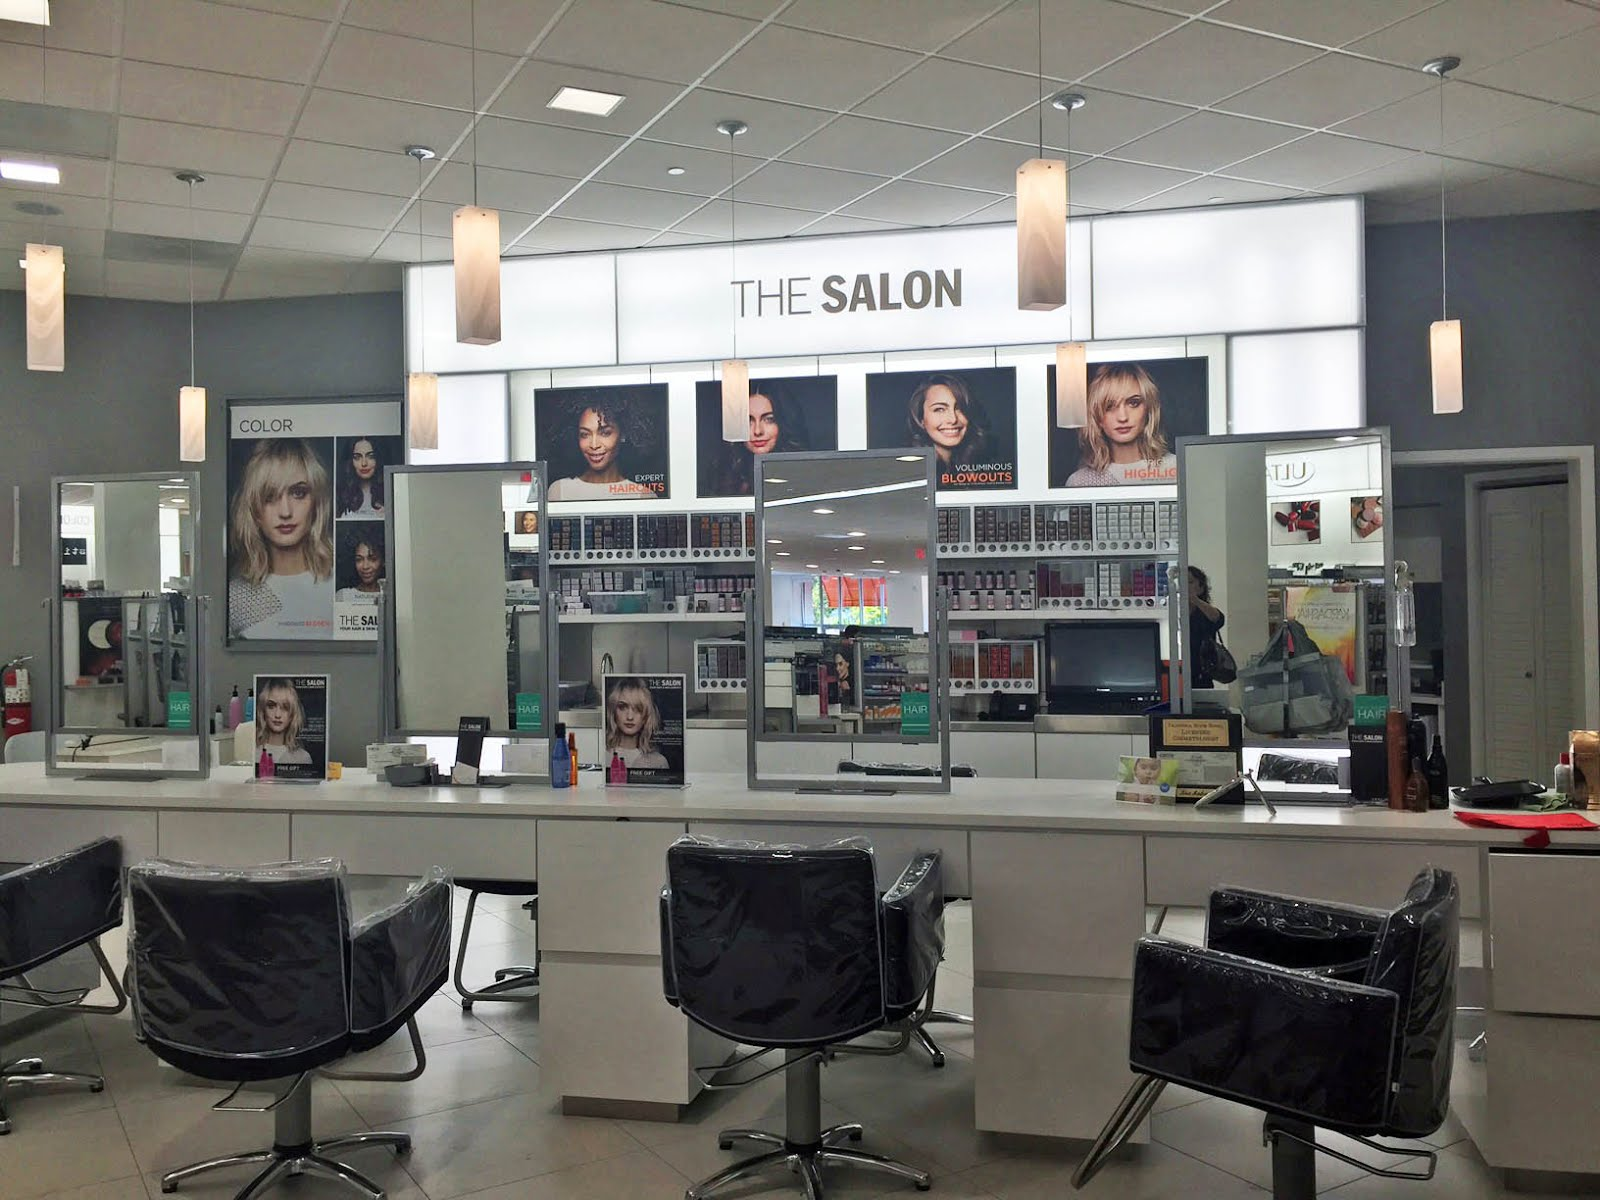 Ulta coupon salon service